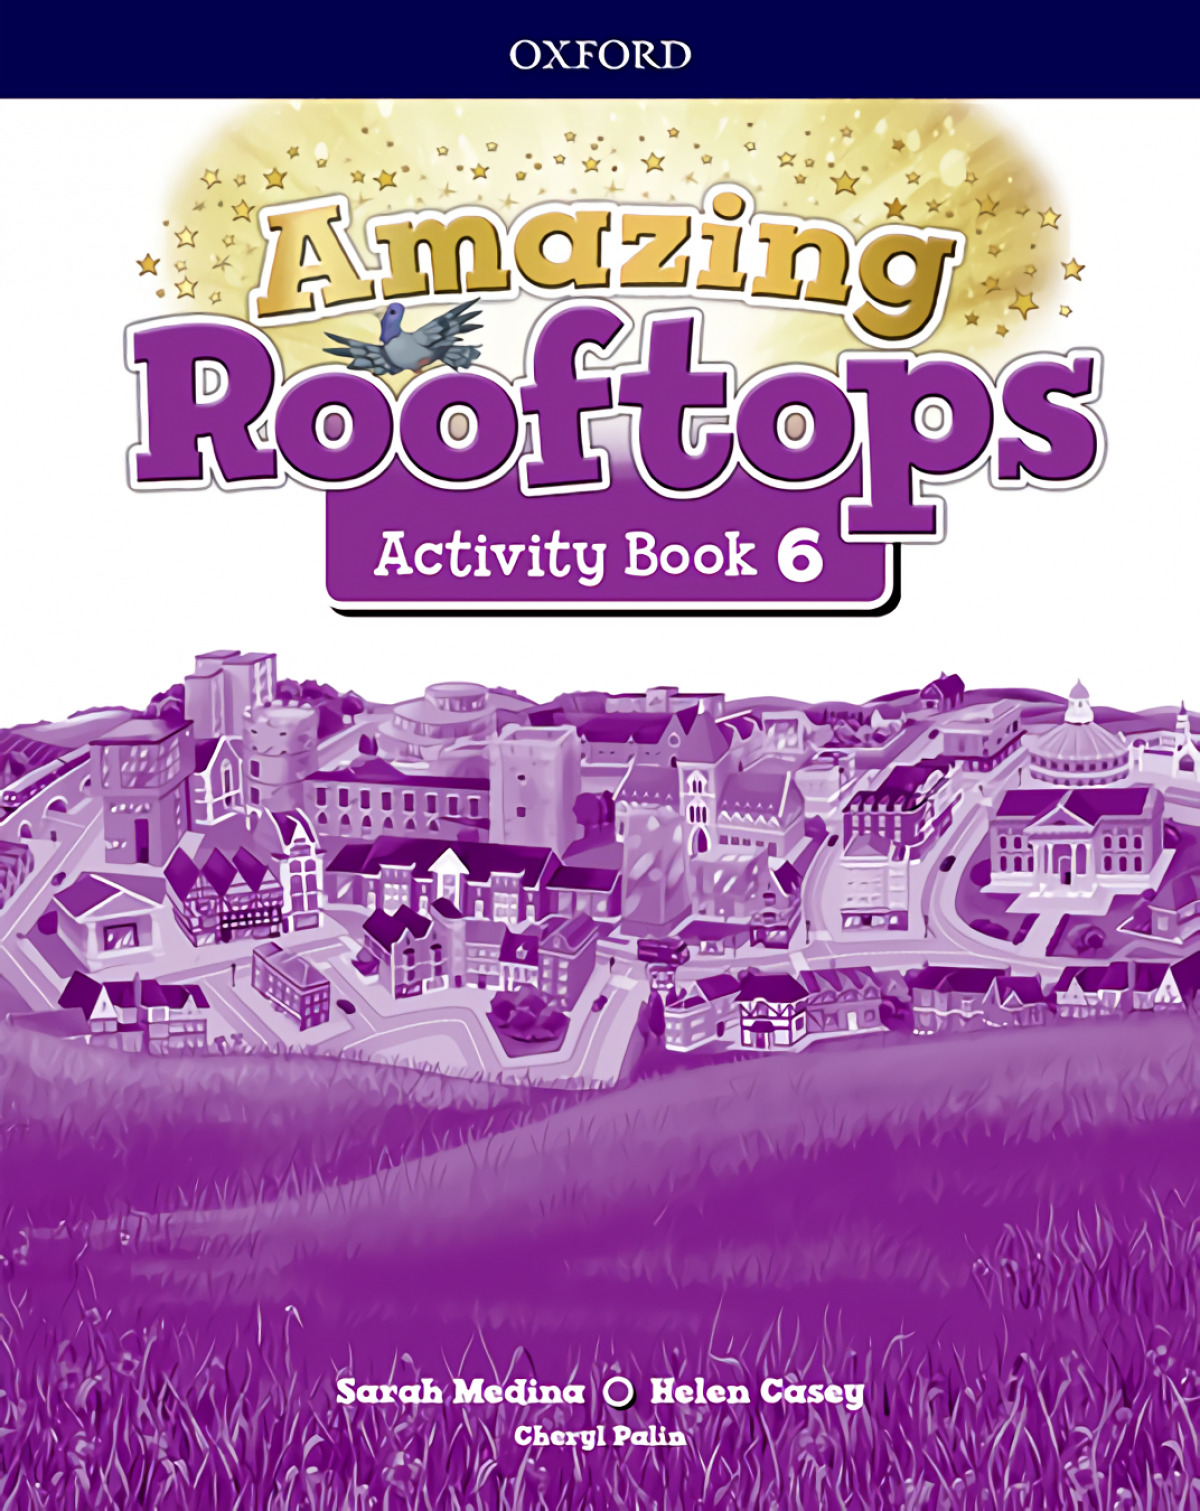 AMAZING ROOFTOPS ACTIVITY BOOK 6